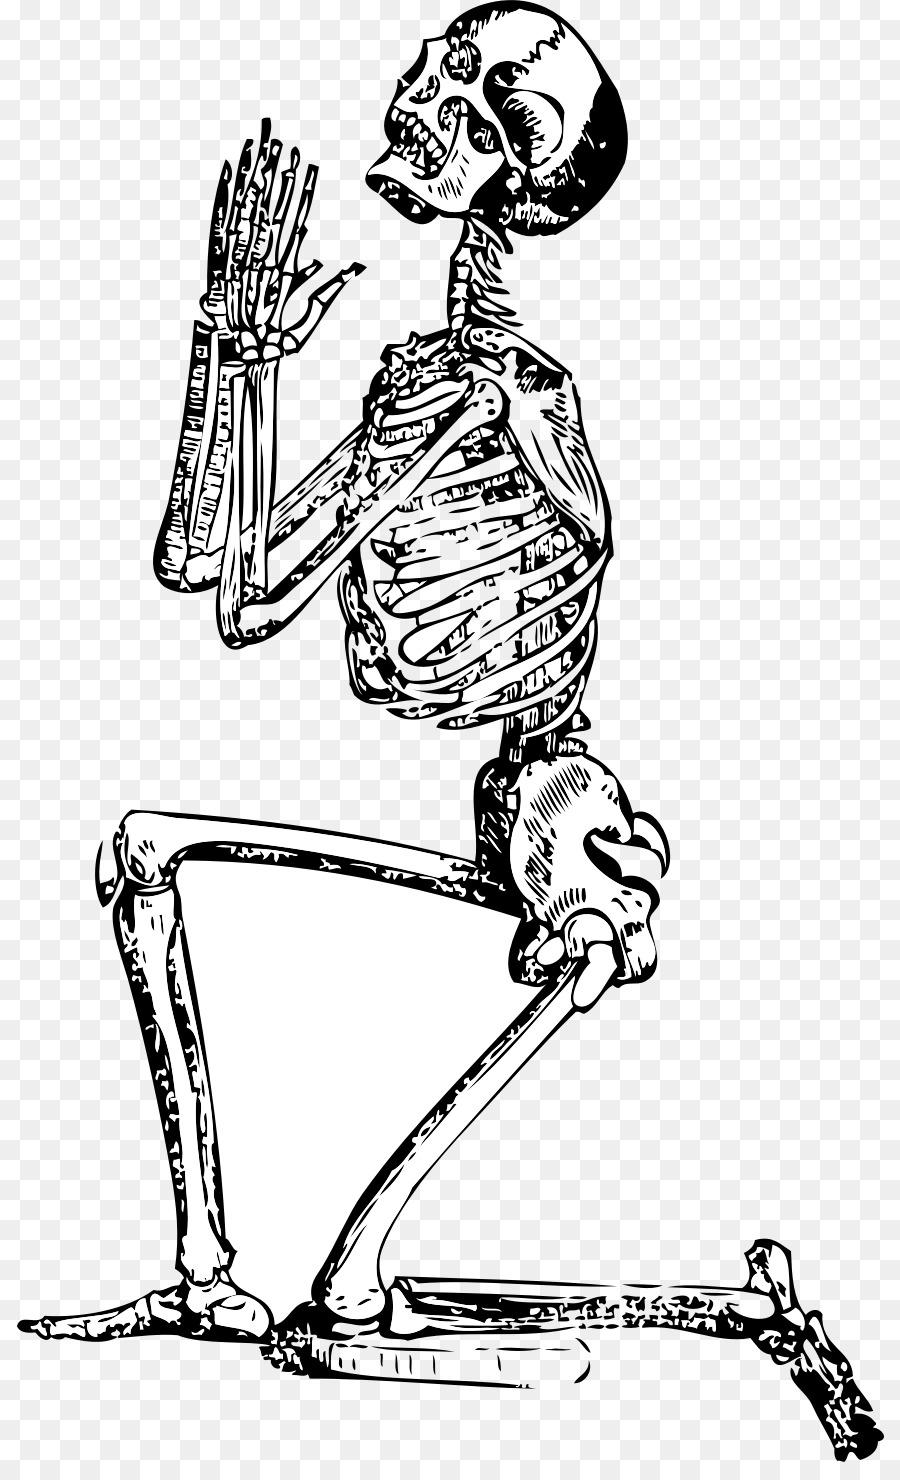 a4ca184bf Skeleton Prayer Drawing Clip art - bones png download - 868*1462 ...